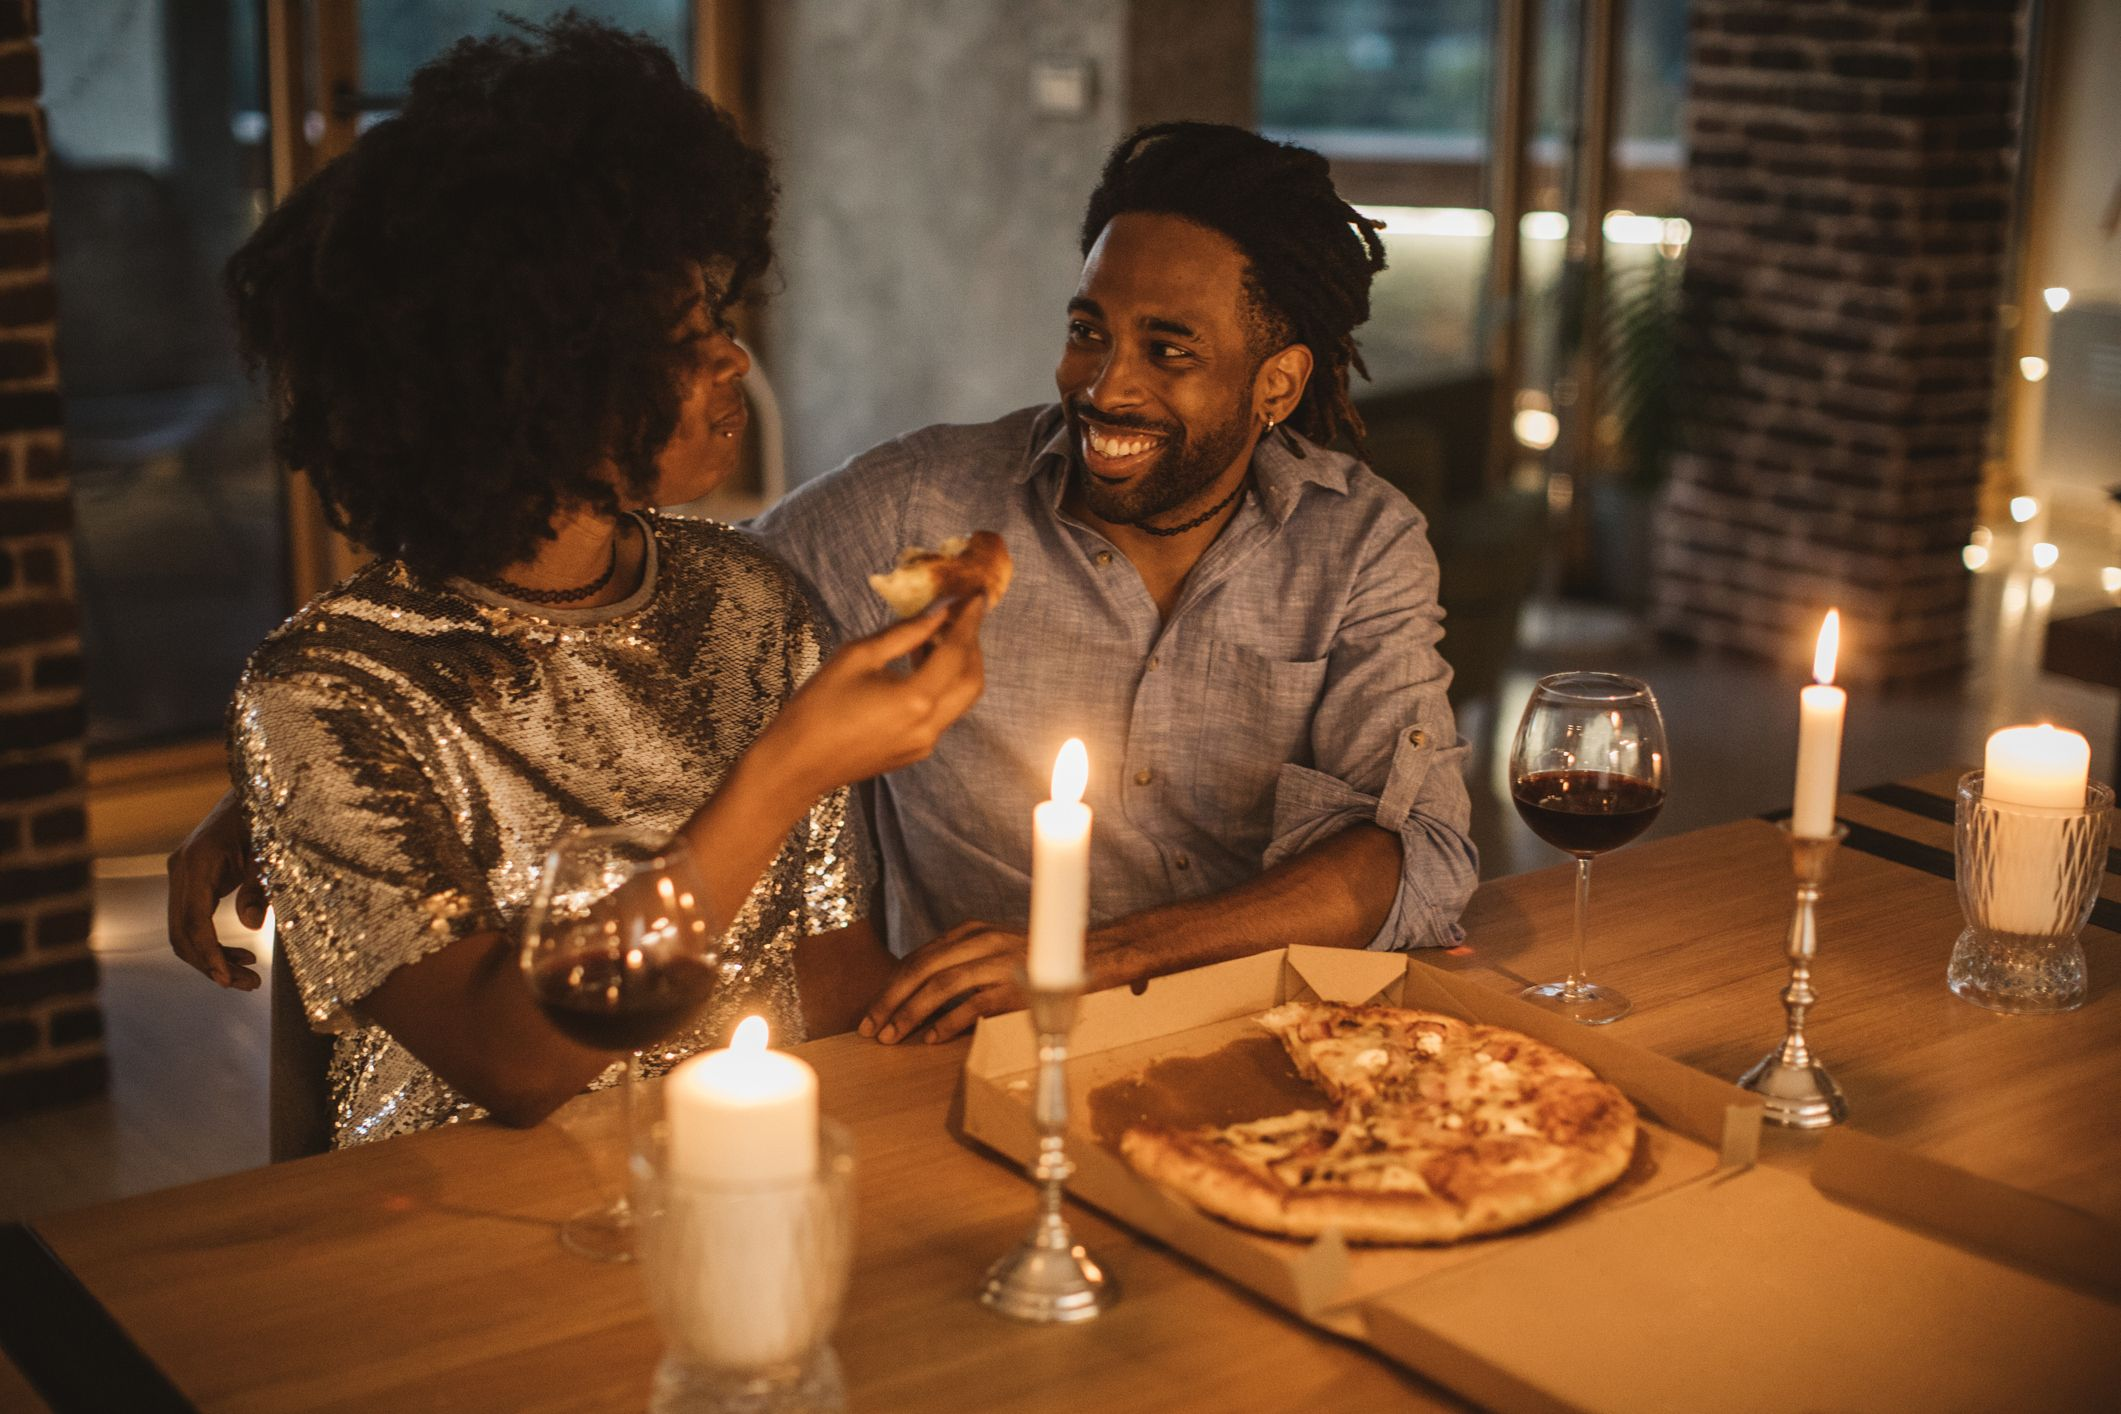 romantiline pitsaõhtu kodus